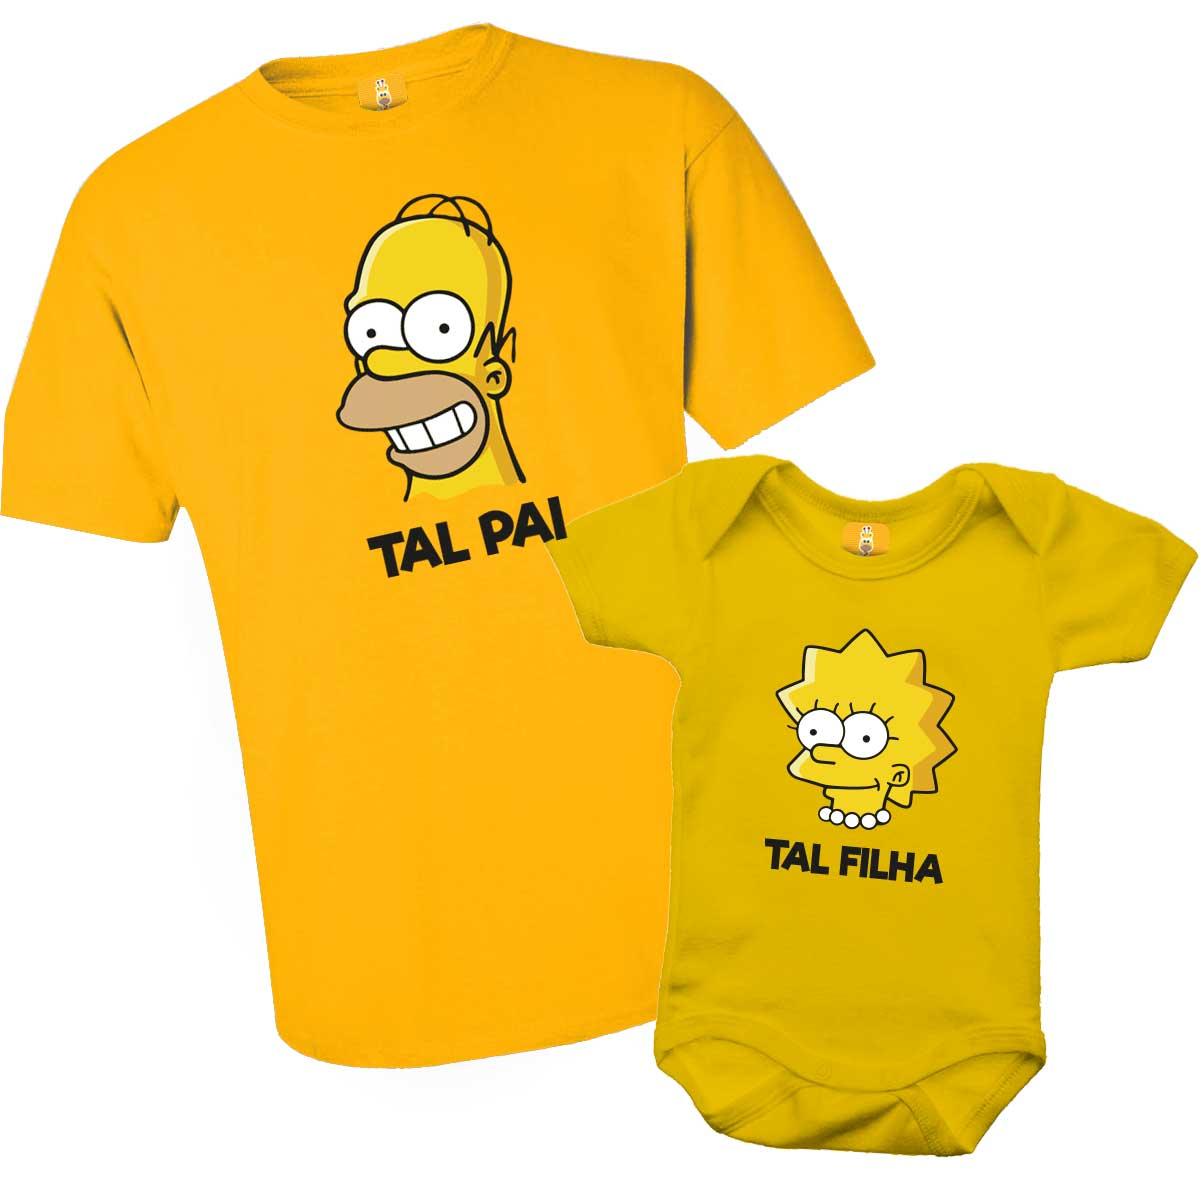 Camiseta Simpsons Tal pai Tal filho com 2 peças